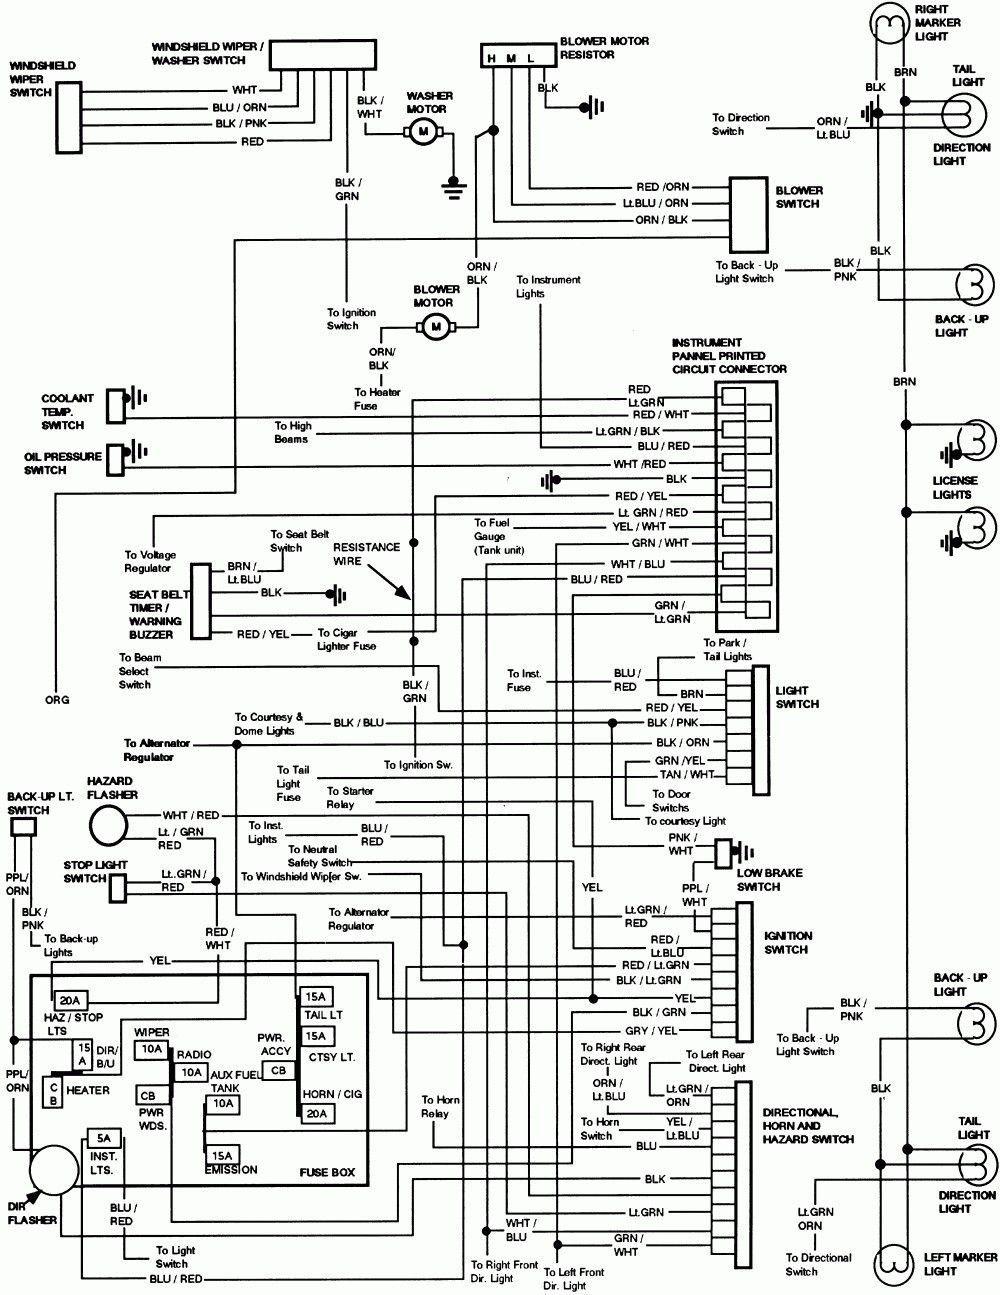 2006 Honda Crv Wiring Diagram Wiring Diagram 175744 Amazing Wiring Diagram Collection Diagram Honda Crv Honda